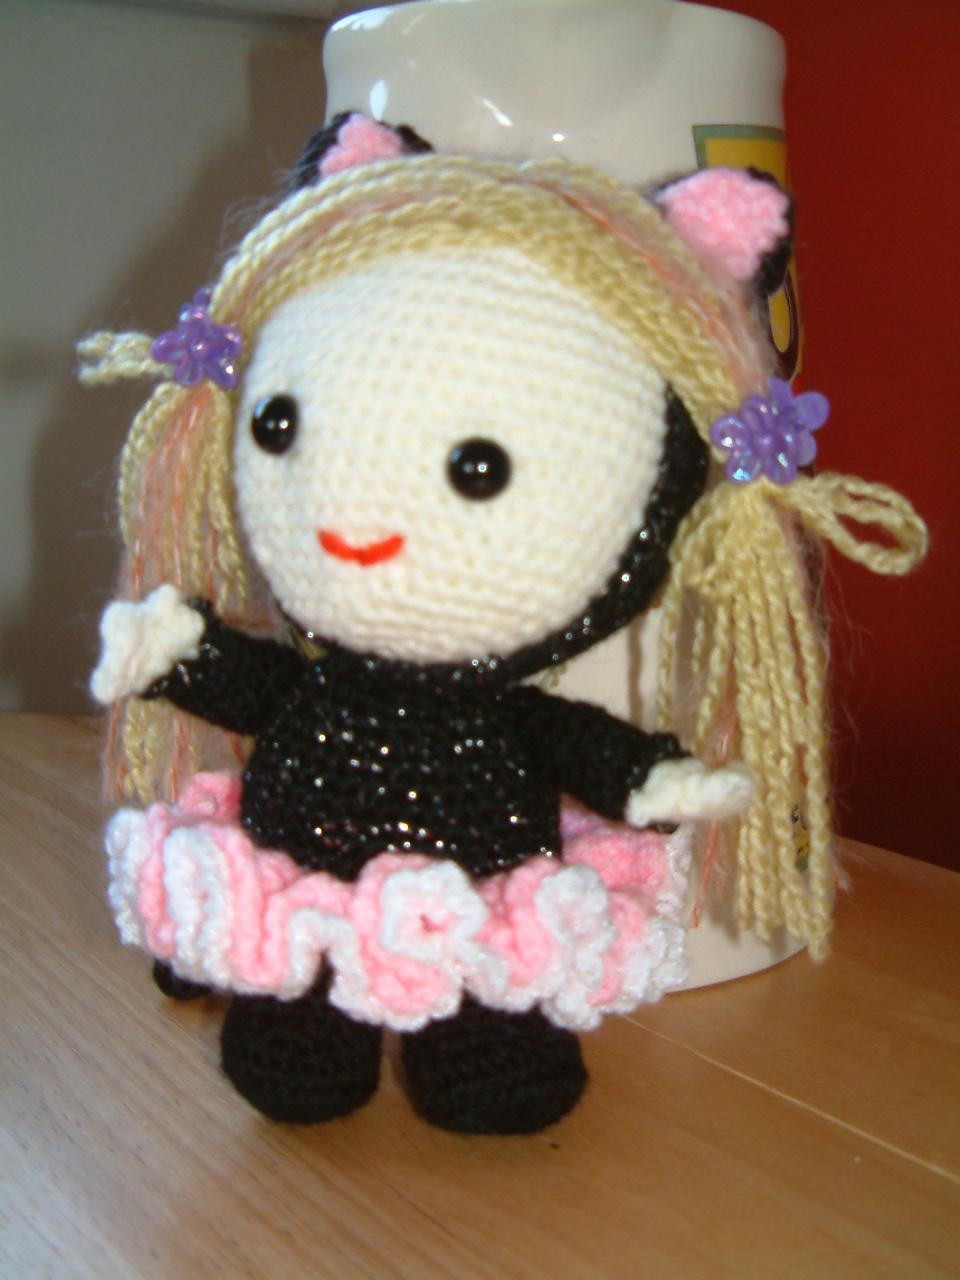 Amigurumi Crochet Patterns K And J Dolls : JUST JOAN: Bella in Ballerina Catsuit ~ Amigurumi crochet ...